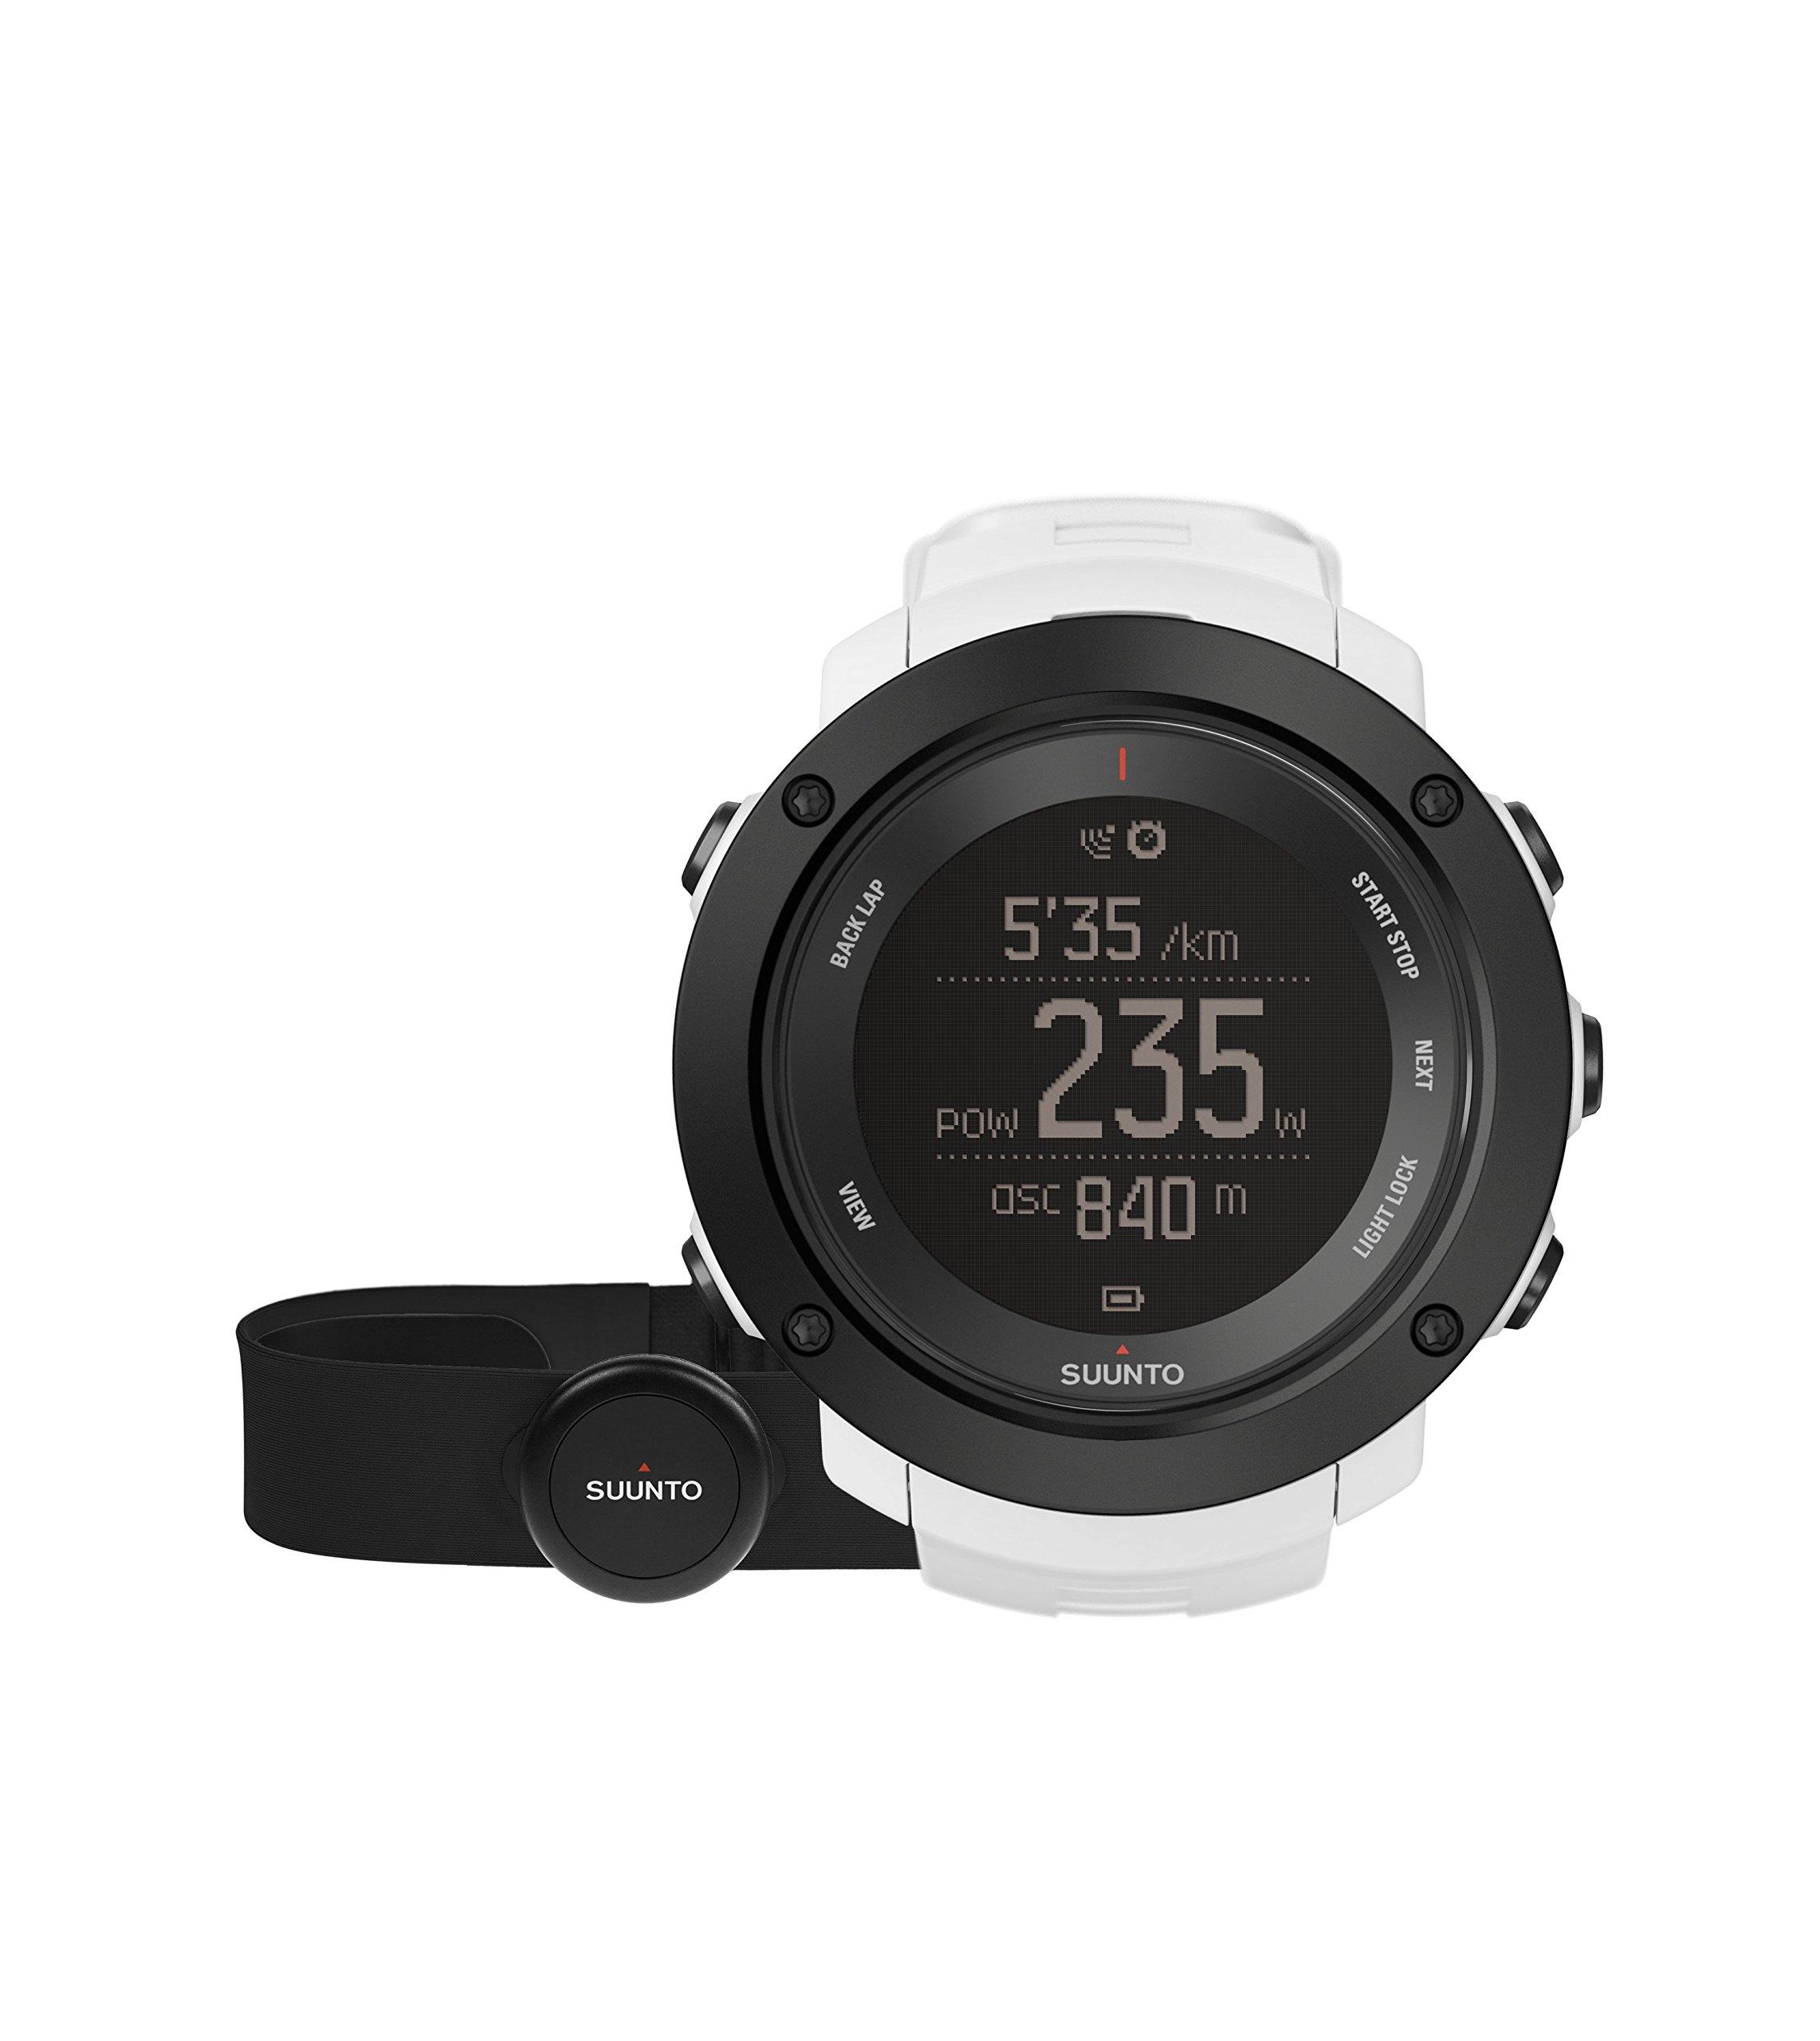 Suunto – Ambit3 Vertical HR – SS021966000 – Reloj GPS Multideporte + Cinturón de frecuencia cardiaca (Talla M) – Ideal para montaña – Blanco